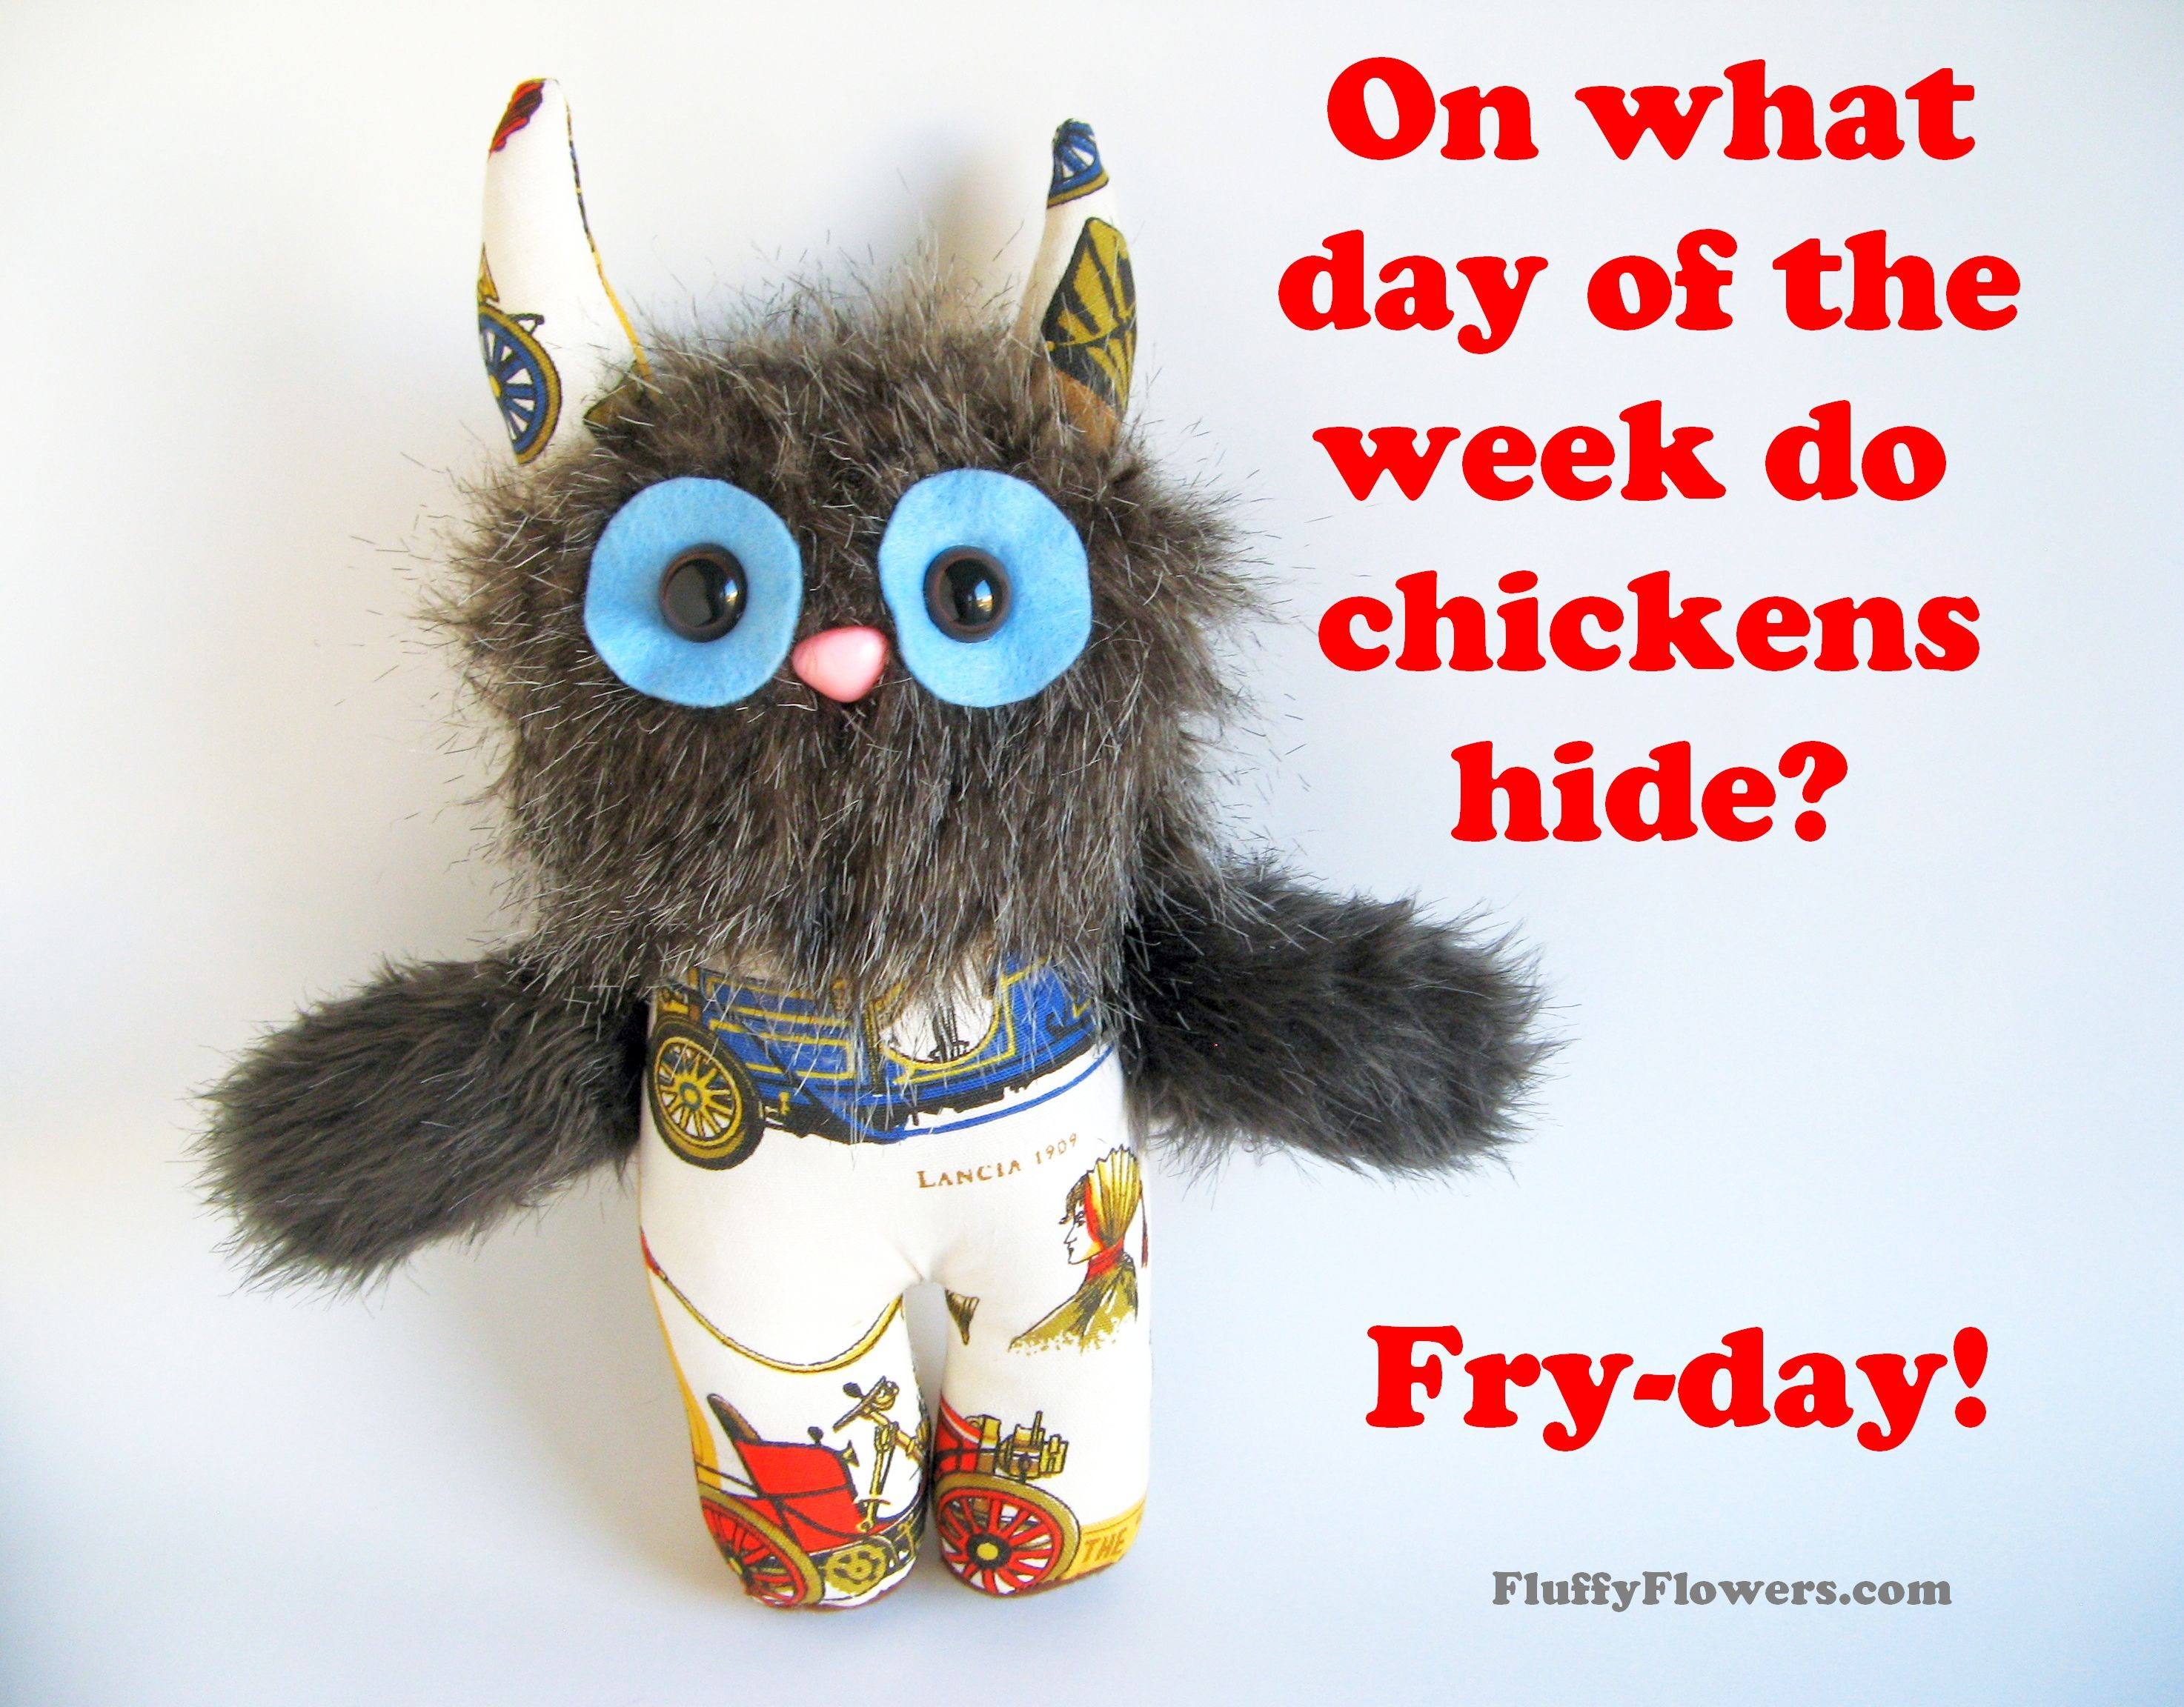 cute & clean Friday chicken joke for children featuring an